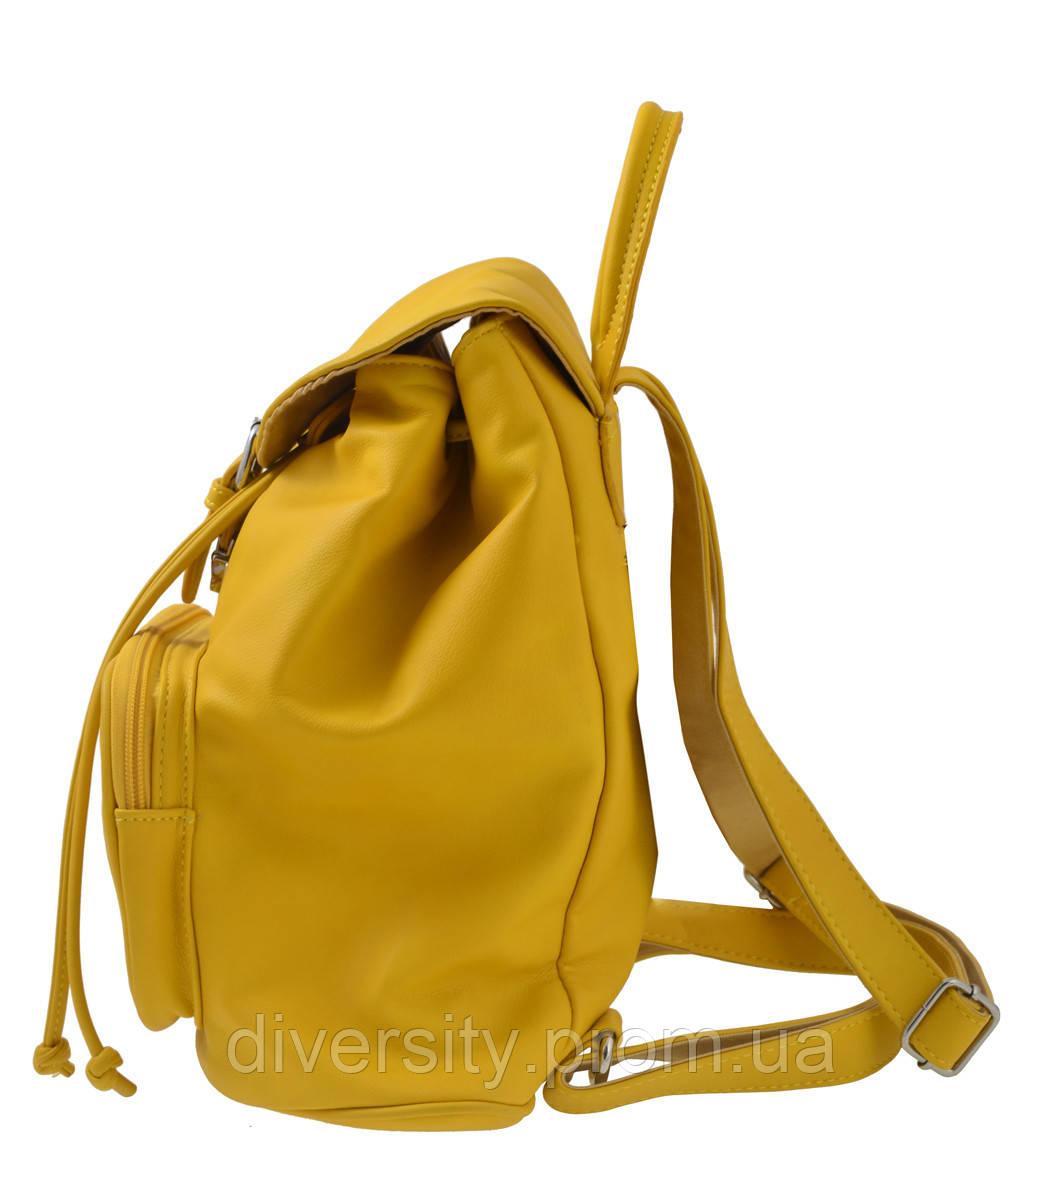 Сумка-рюкзак  YES,  желтый,  31*12*30см